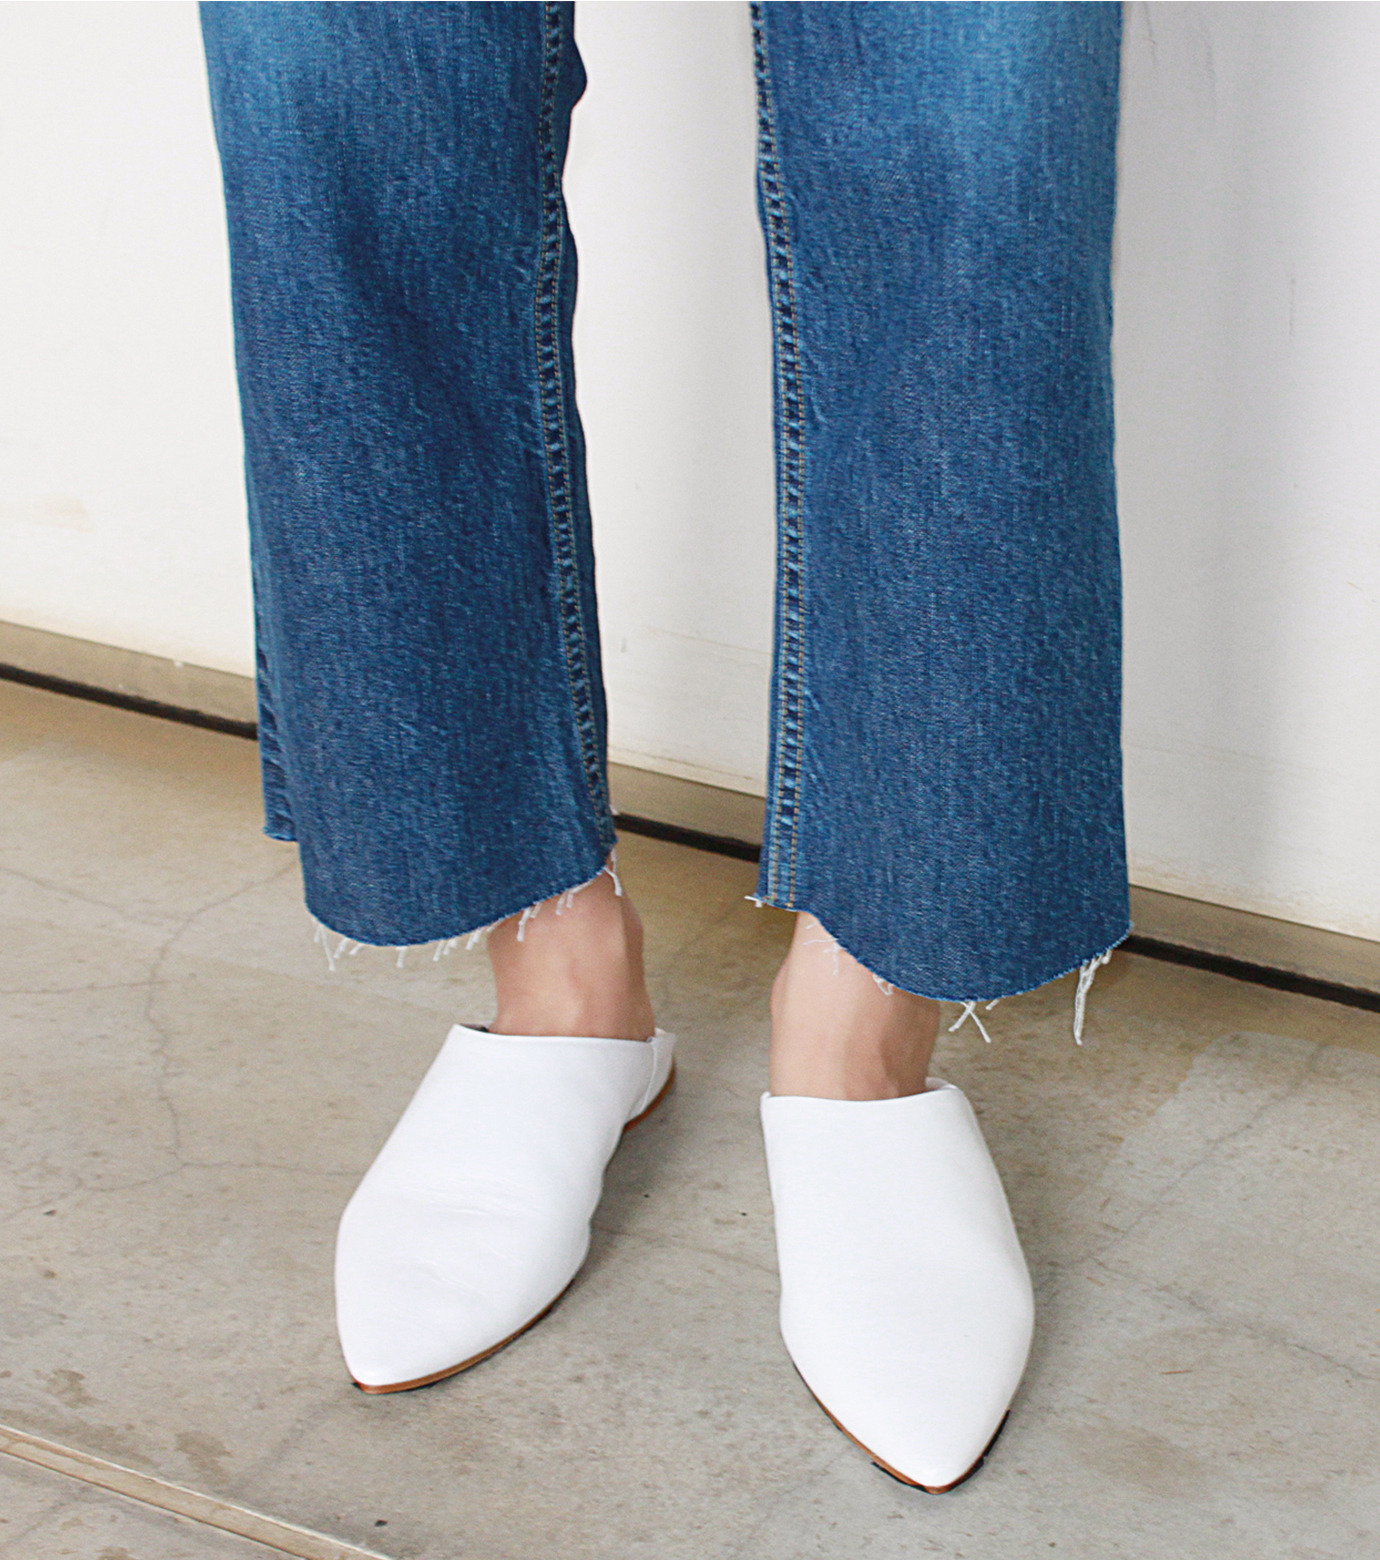 LE CIEL BLEU(ルシェルブルー)のストレートデニムパンツ-INDIGO(パンツ/pants)-18A68202 拡大詳細画像5